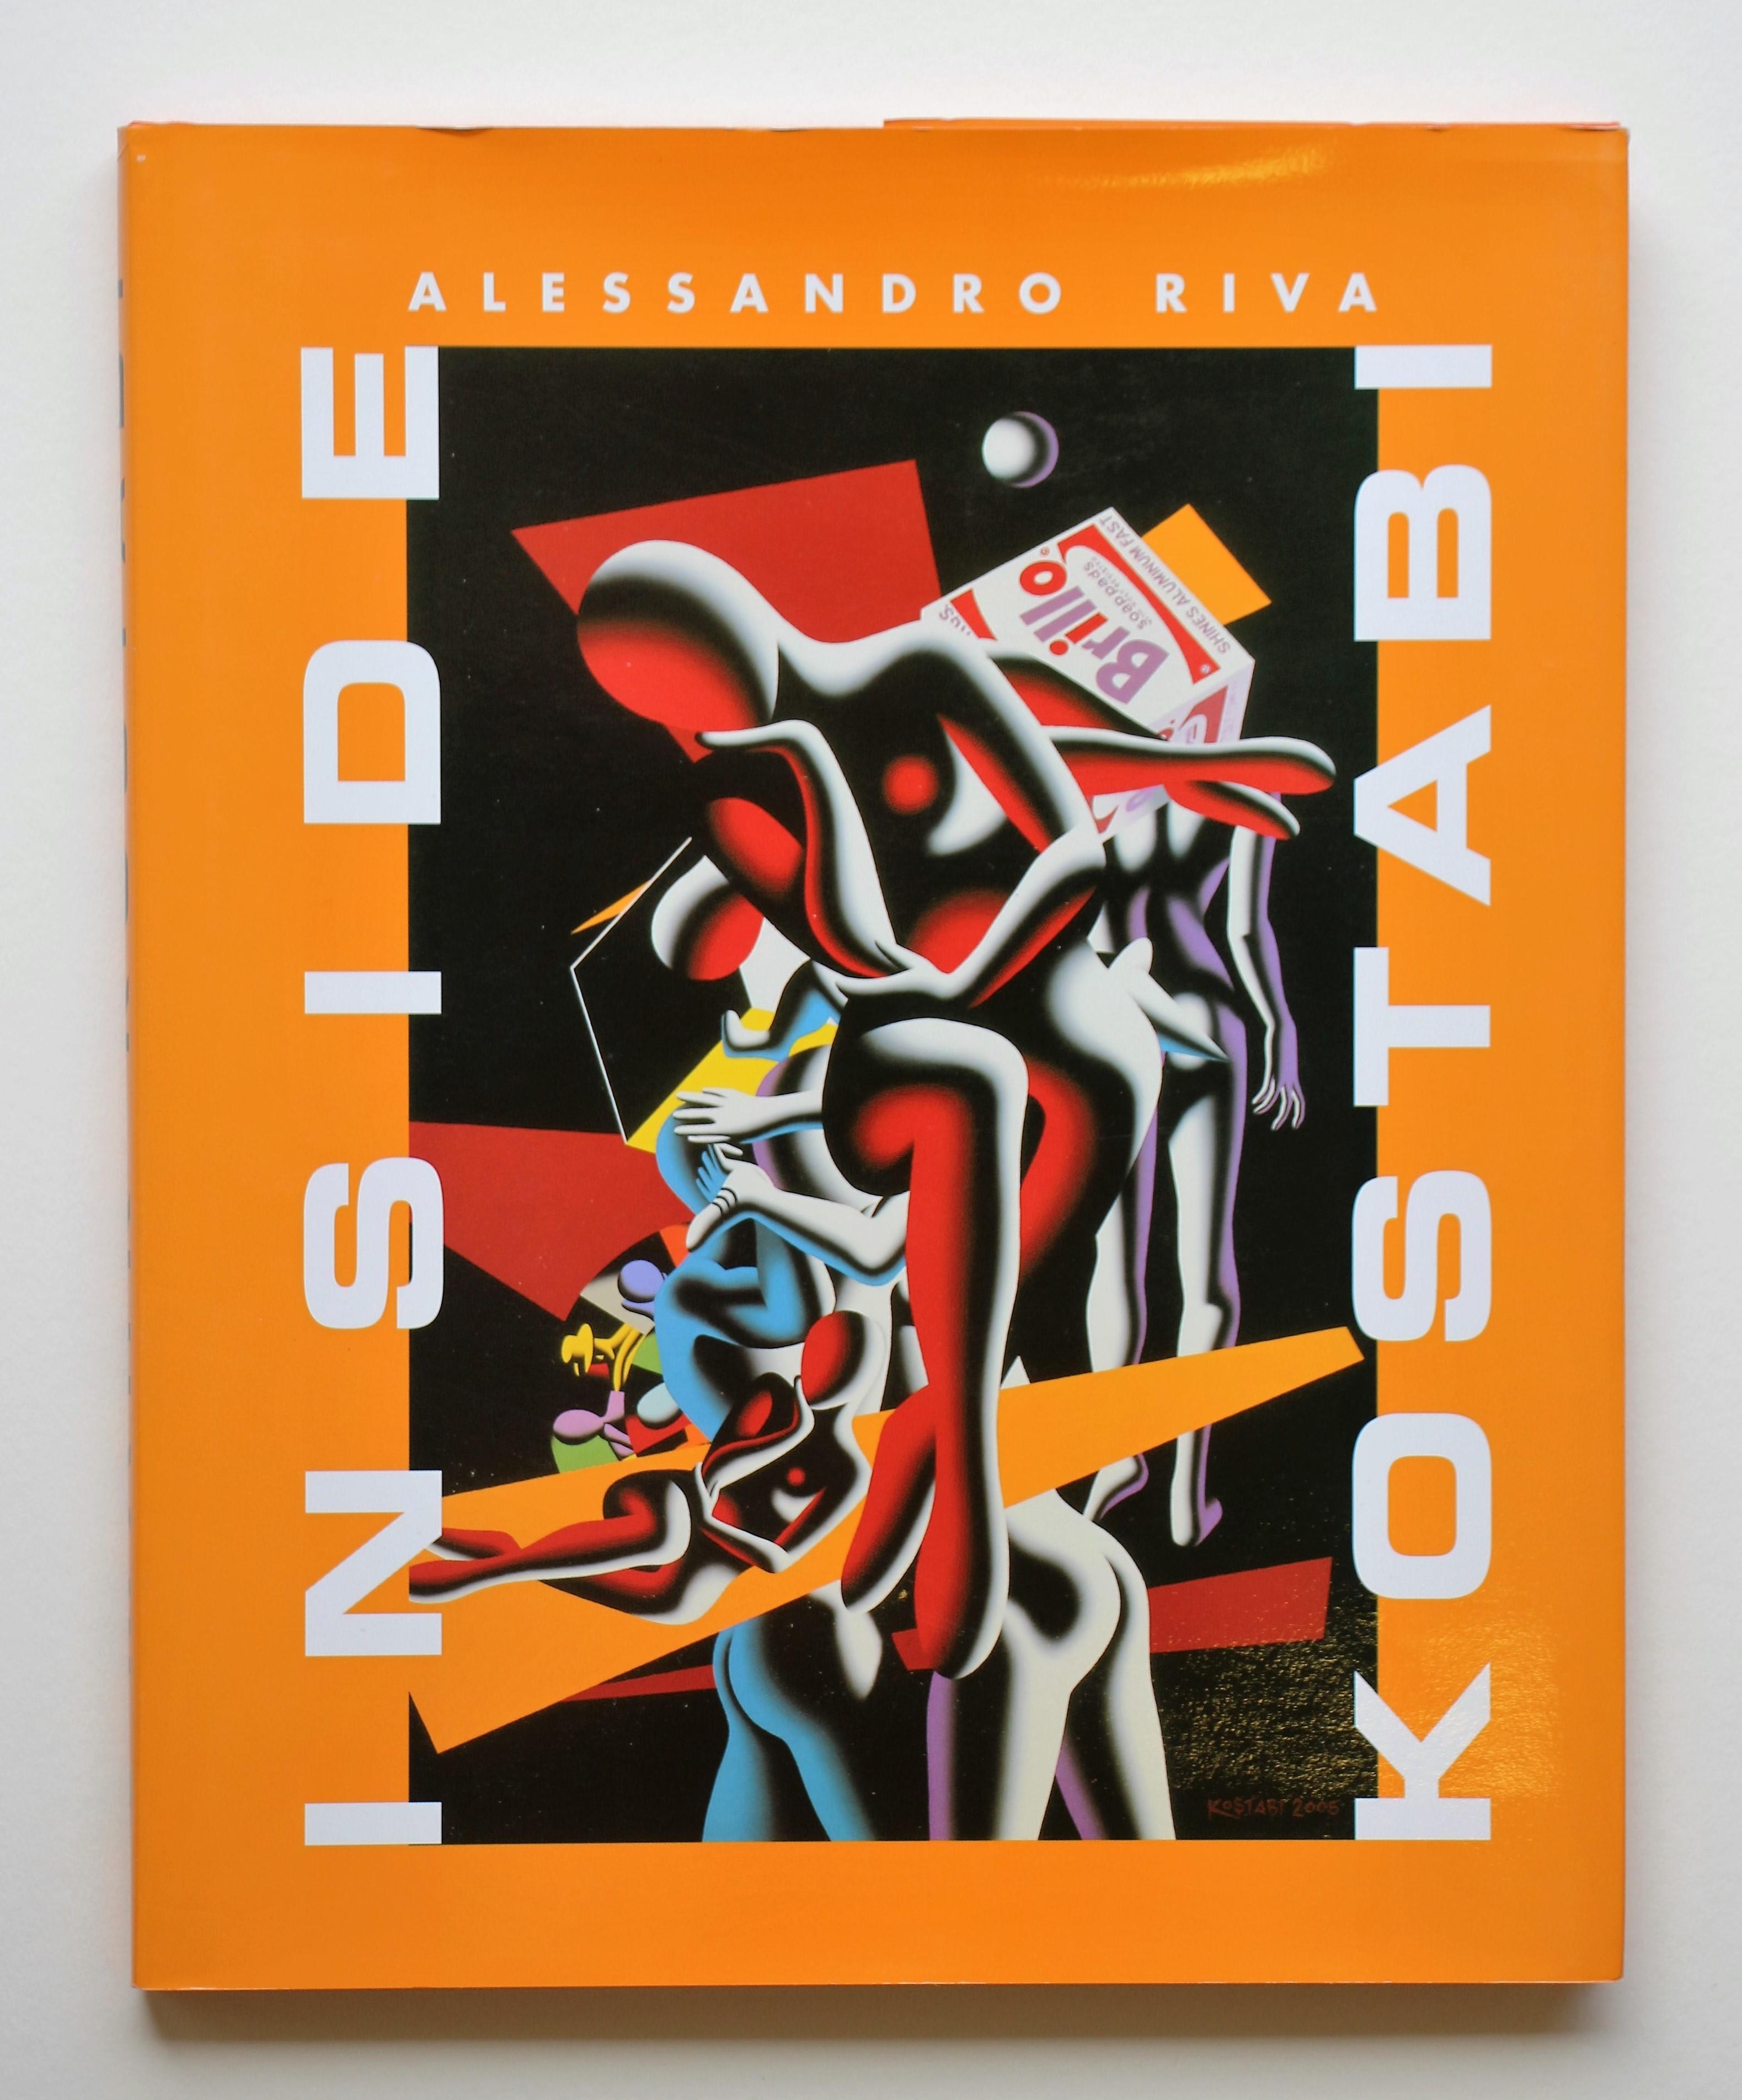 """Inside kostabi"" anno 2006 pagine 109  cm. 31x25"